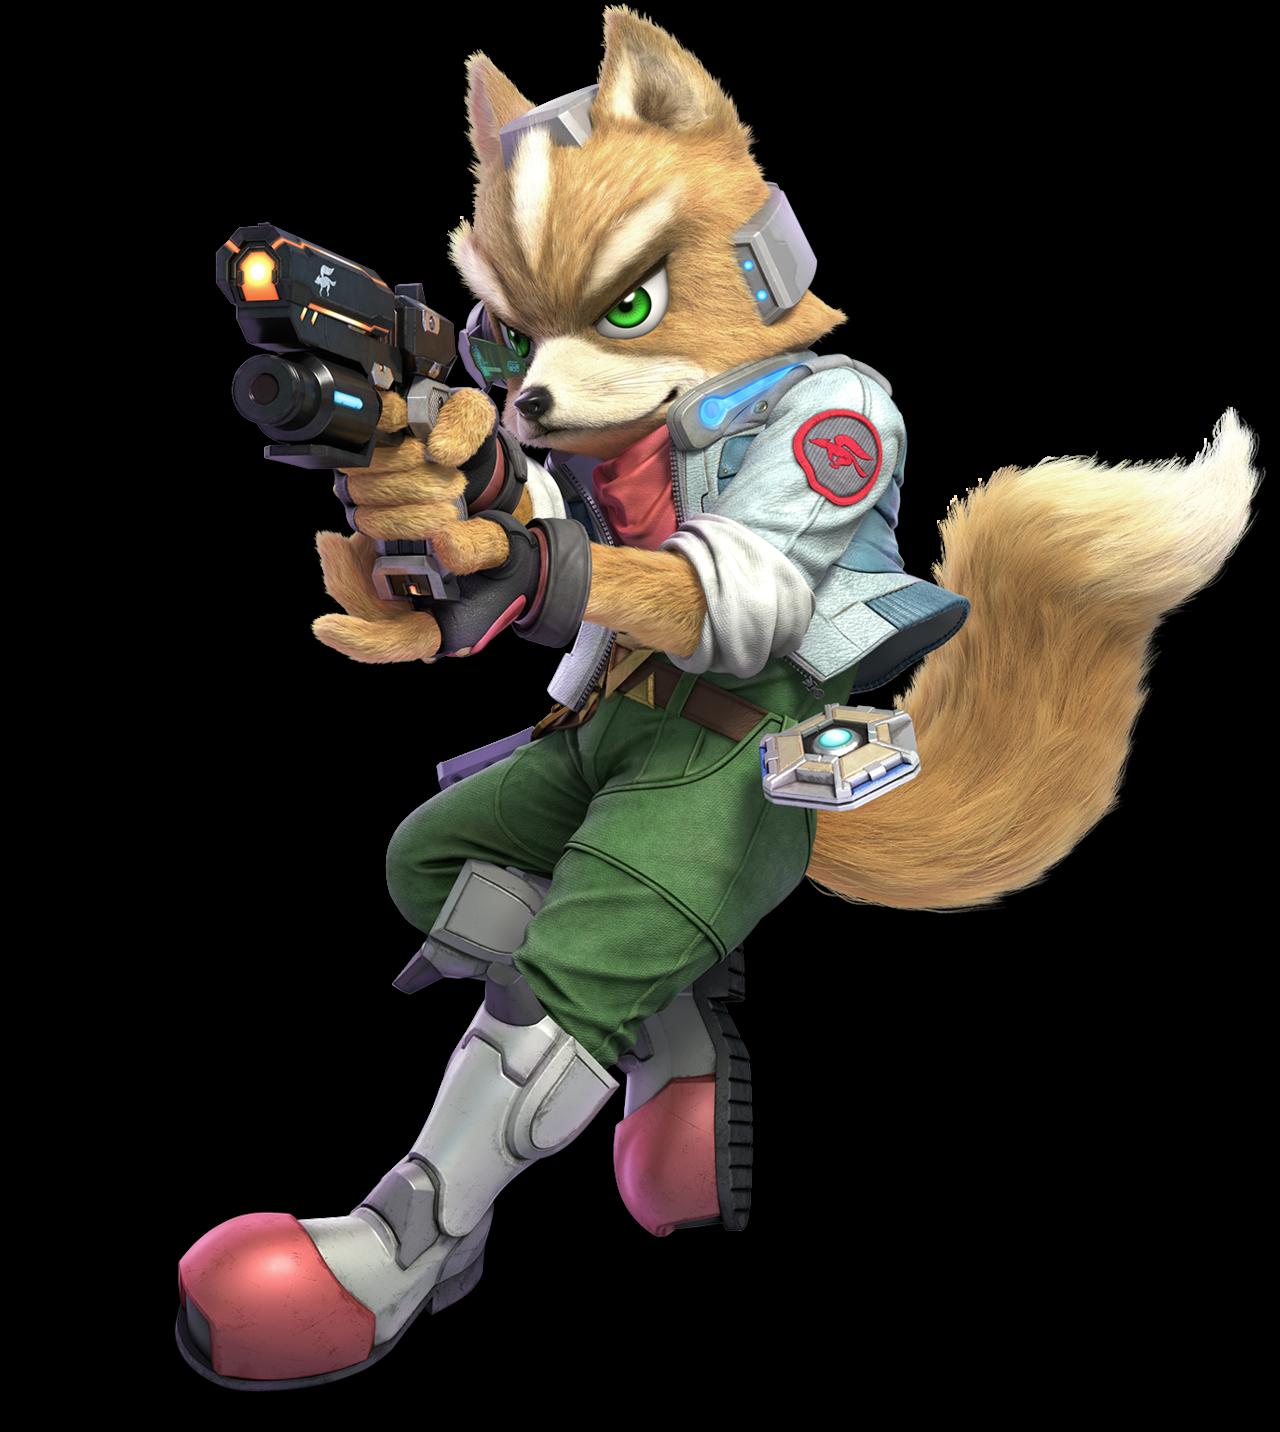 Fox As He Appears In Super Smash Bros Ultimate Star Fox Pokemon Personagem